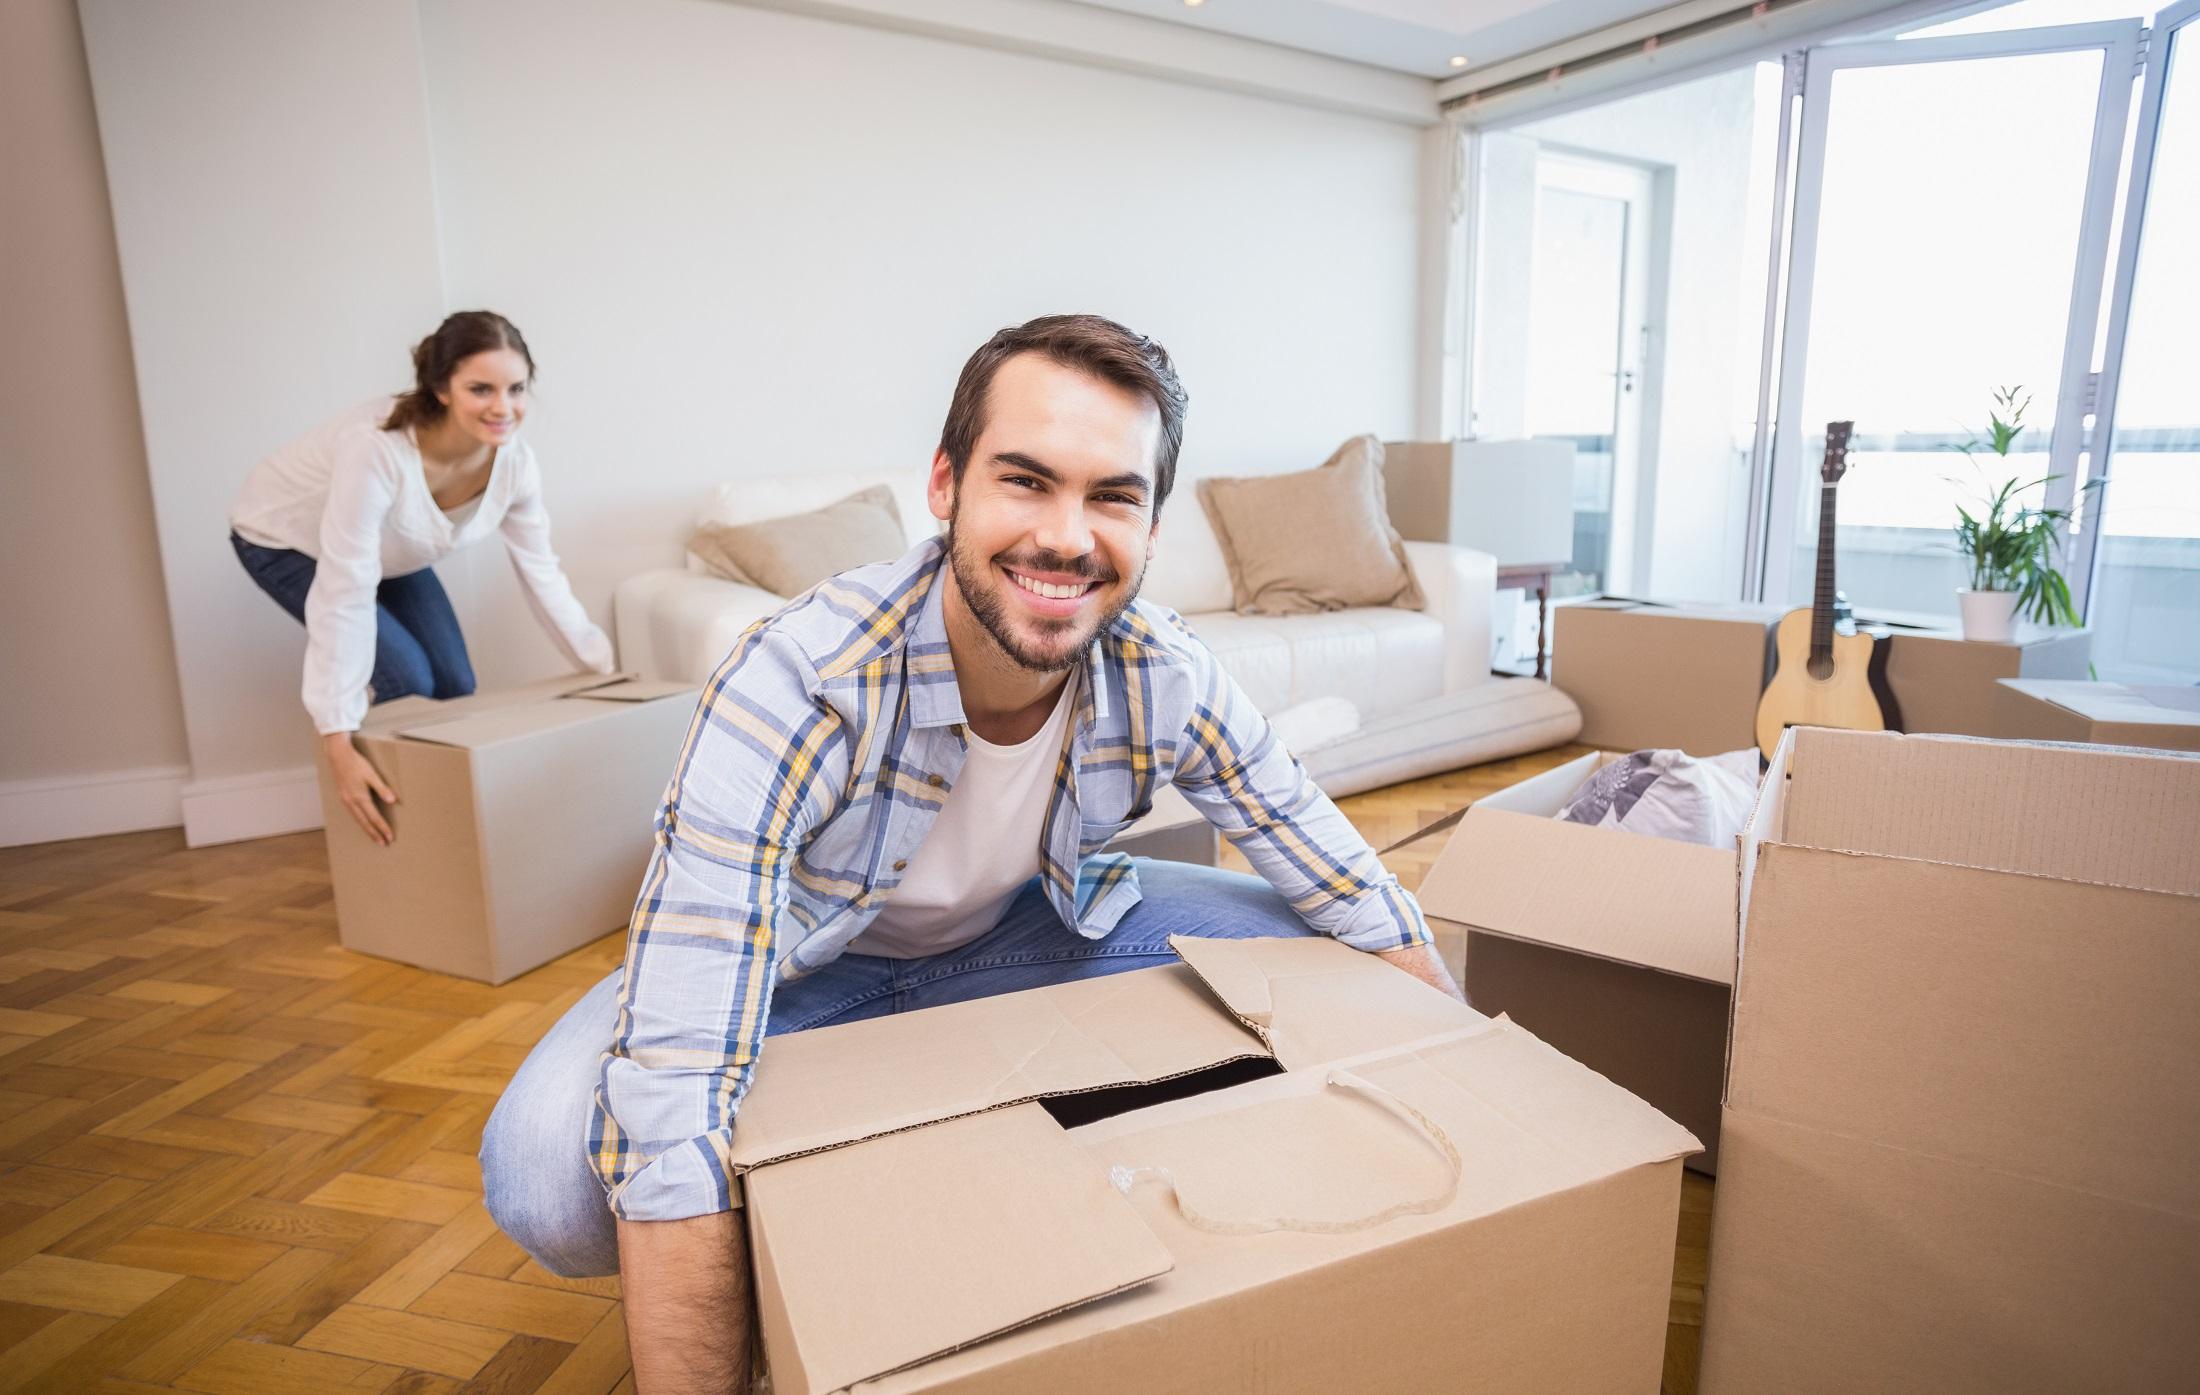 get an apartment with bad credit in 7 steps gobankingrates. Black Bedroom Furniture Sets. Home Design Ideas